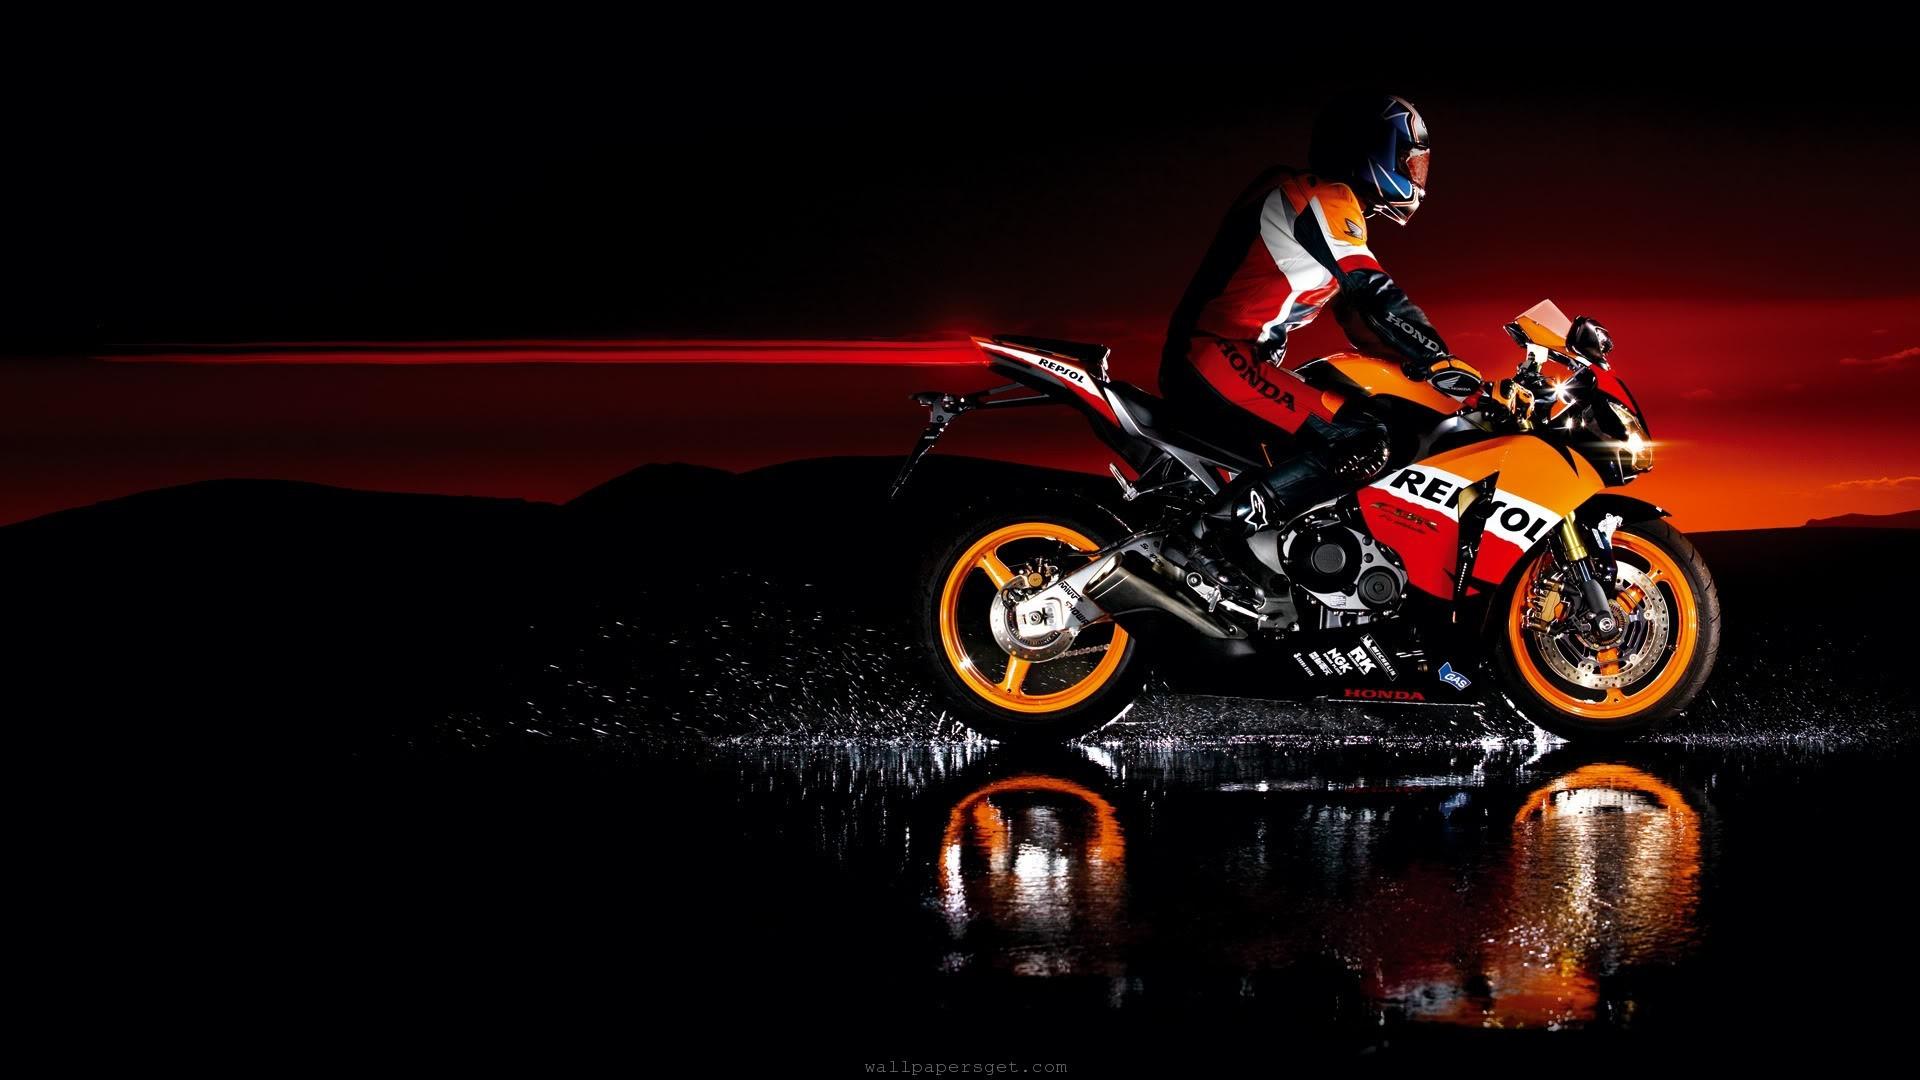 Motorcycle Wallpaper Hd  WallpaperSafari